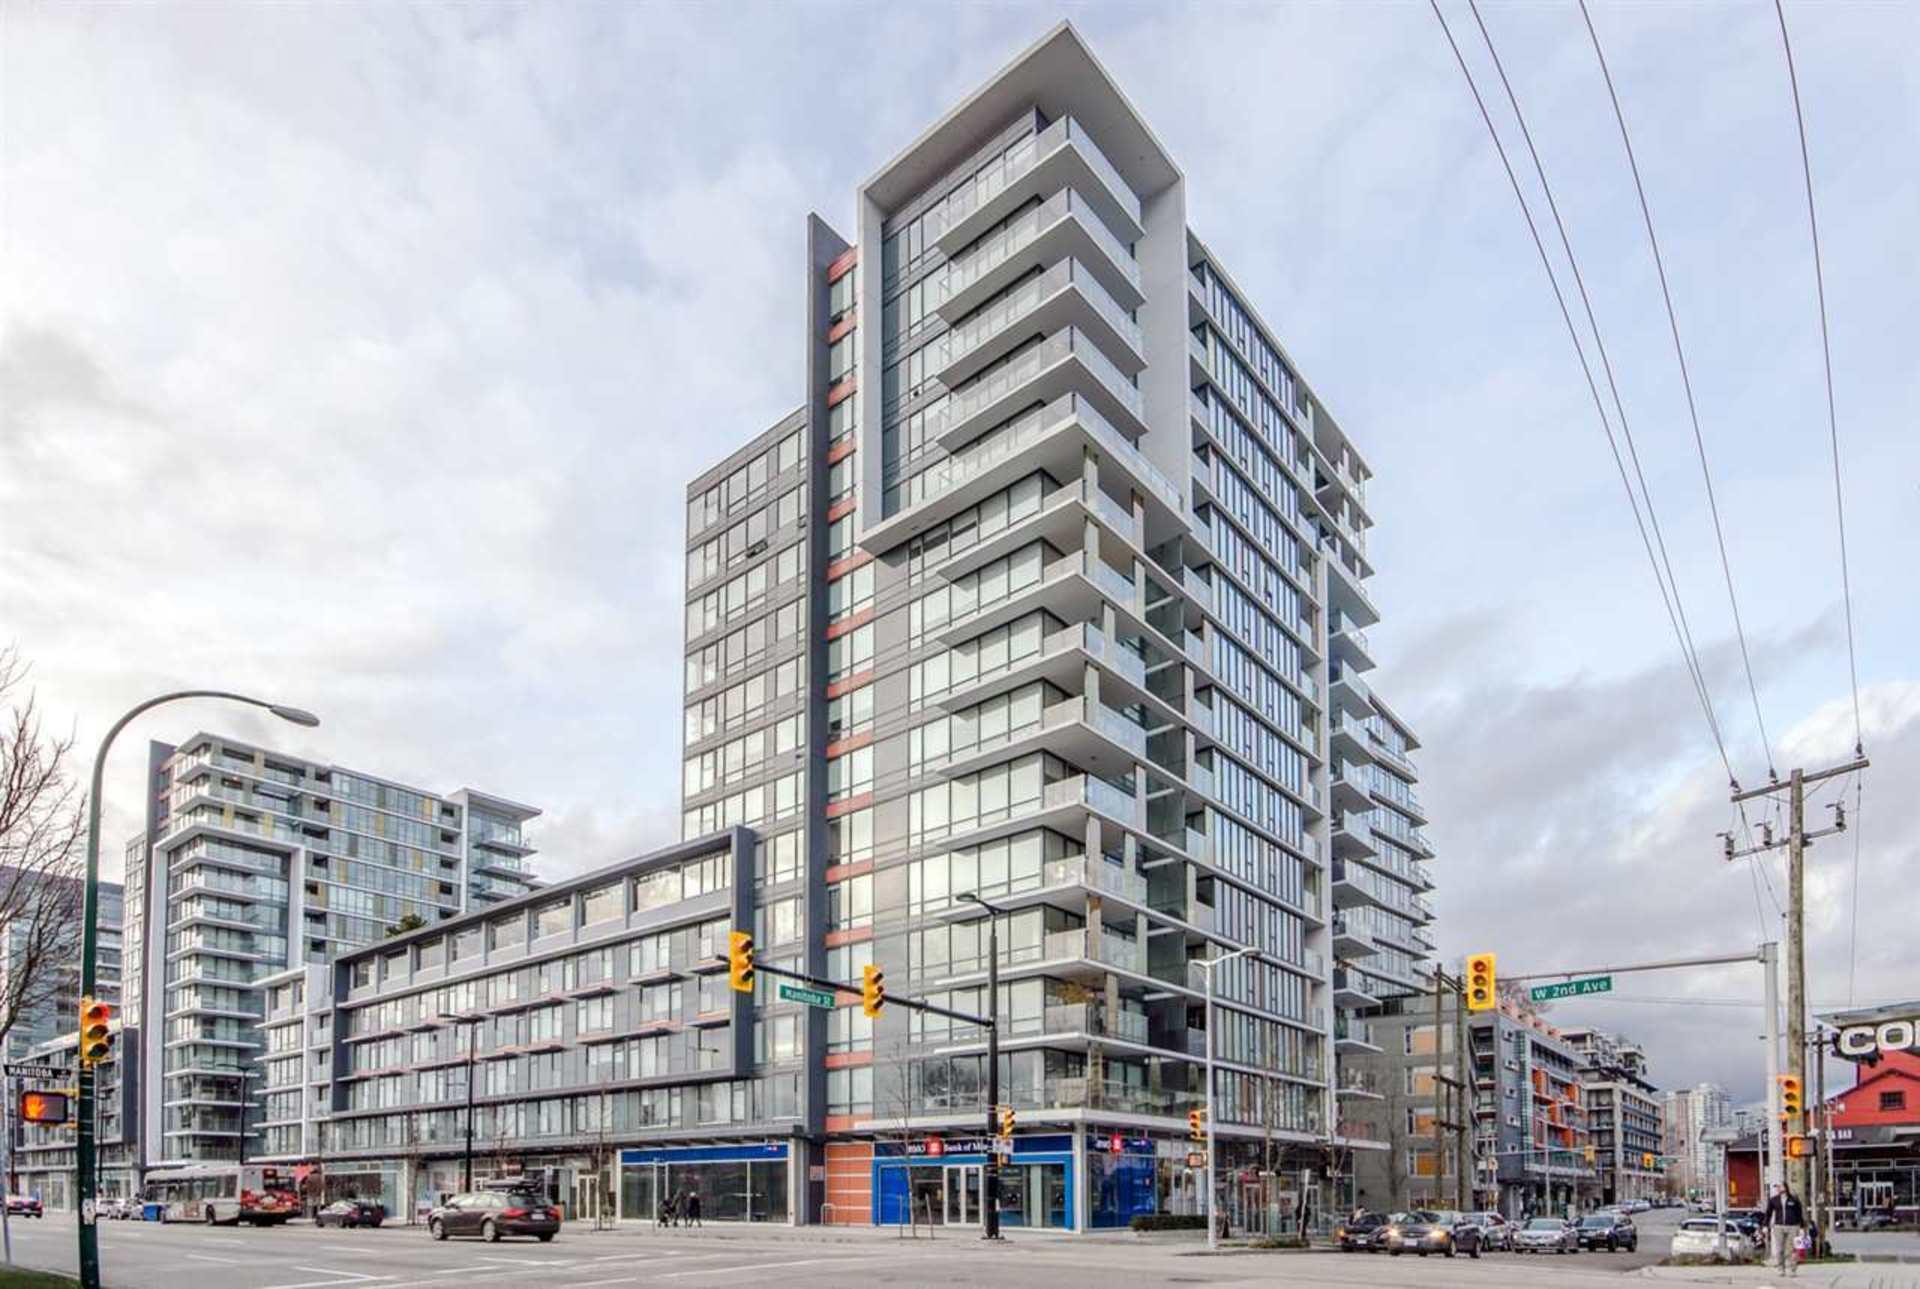 1783-manitoba-street-false-creek-vancouver-west-01 at 616 - 1783 Manitoba Street, False Creek, Vancouver West